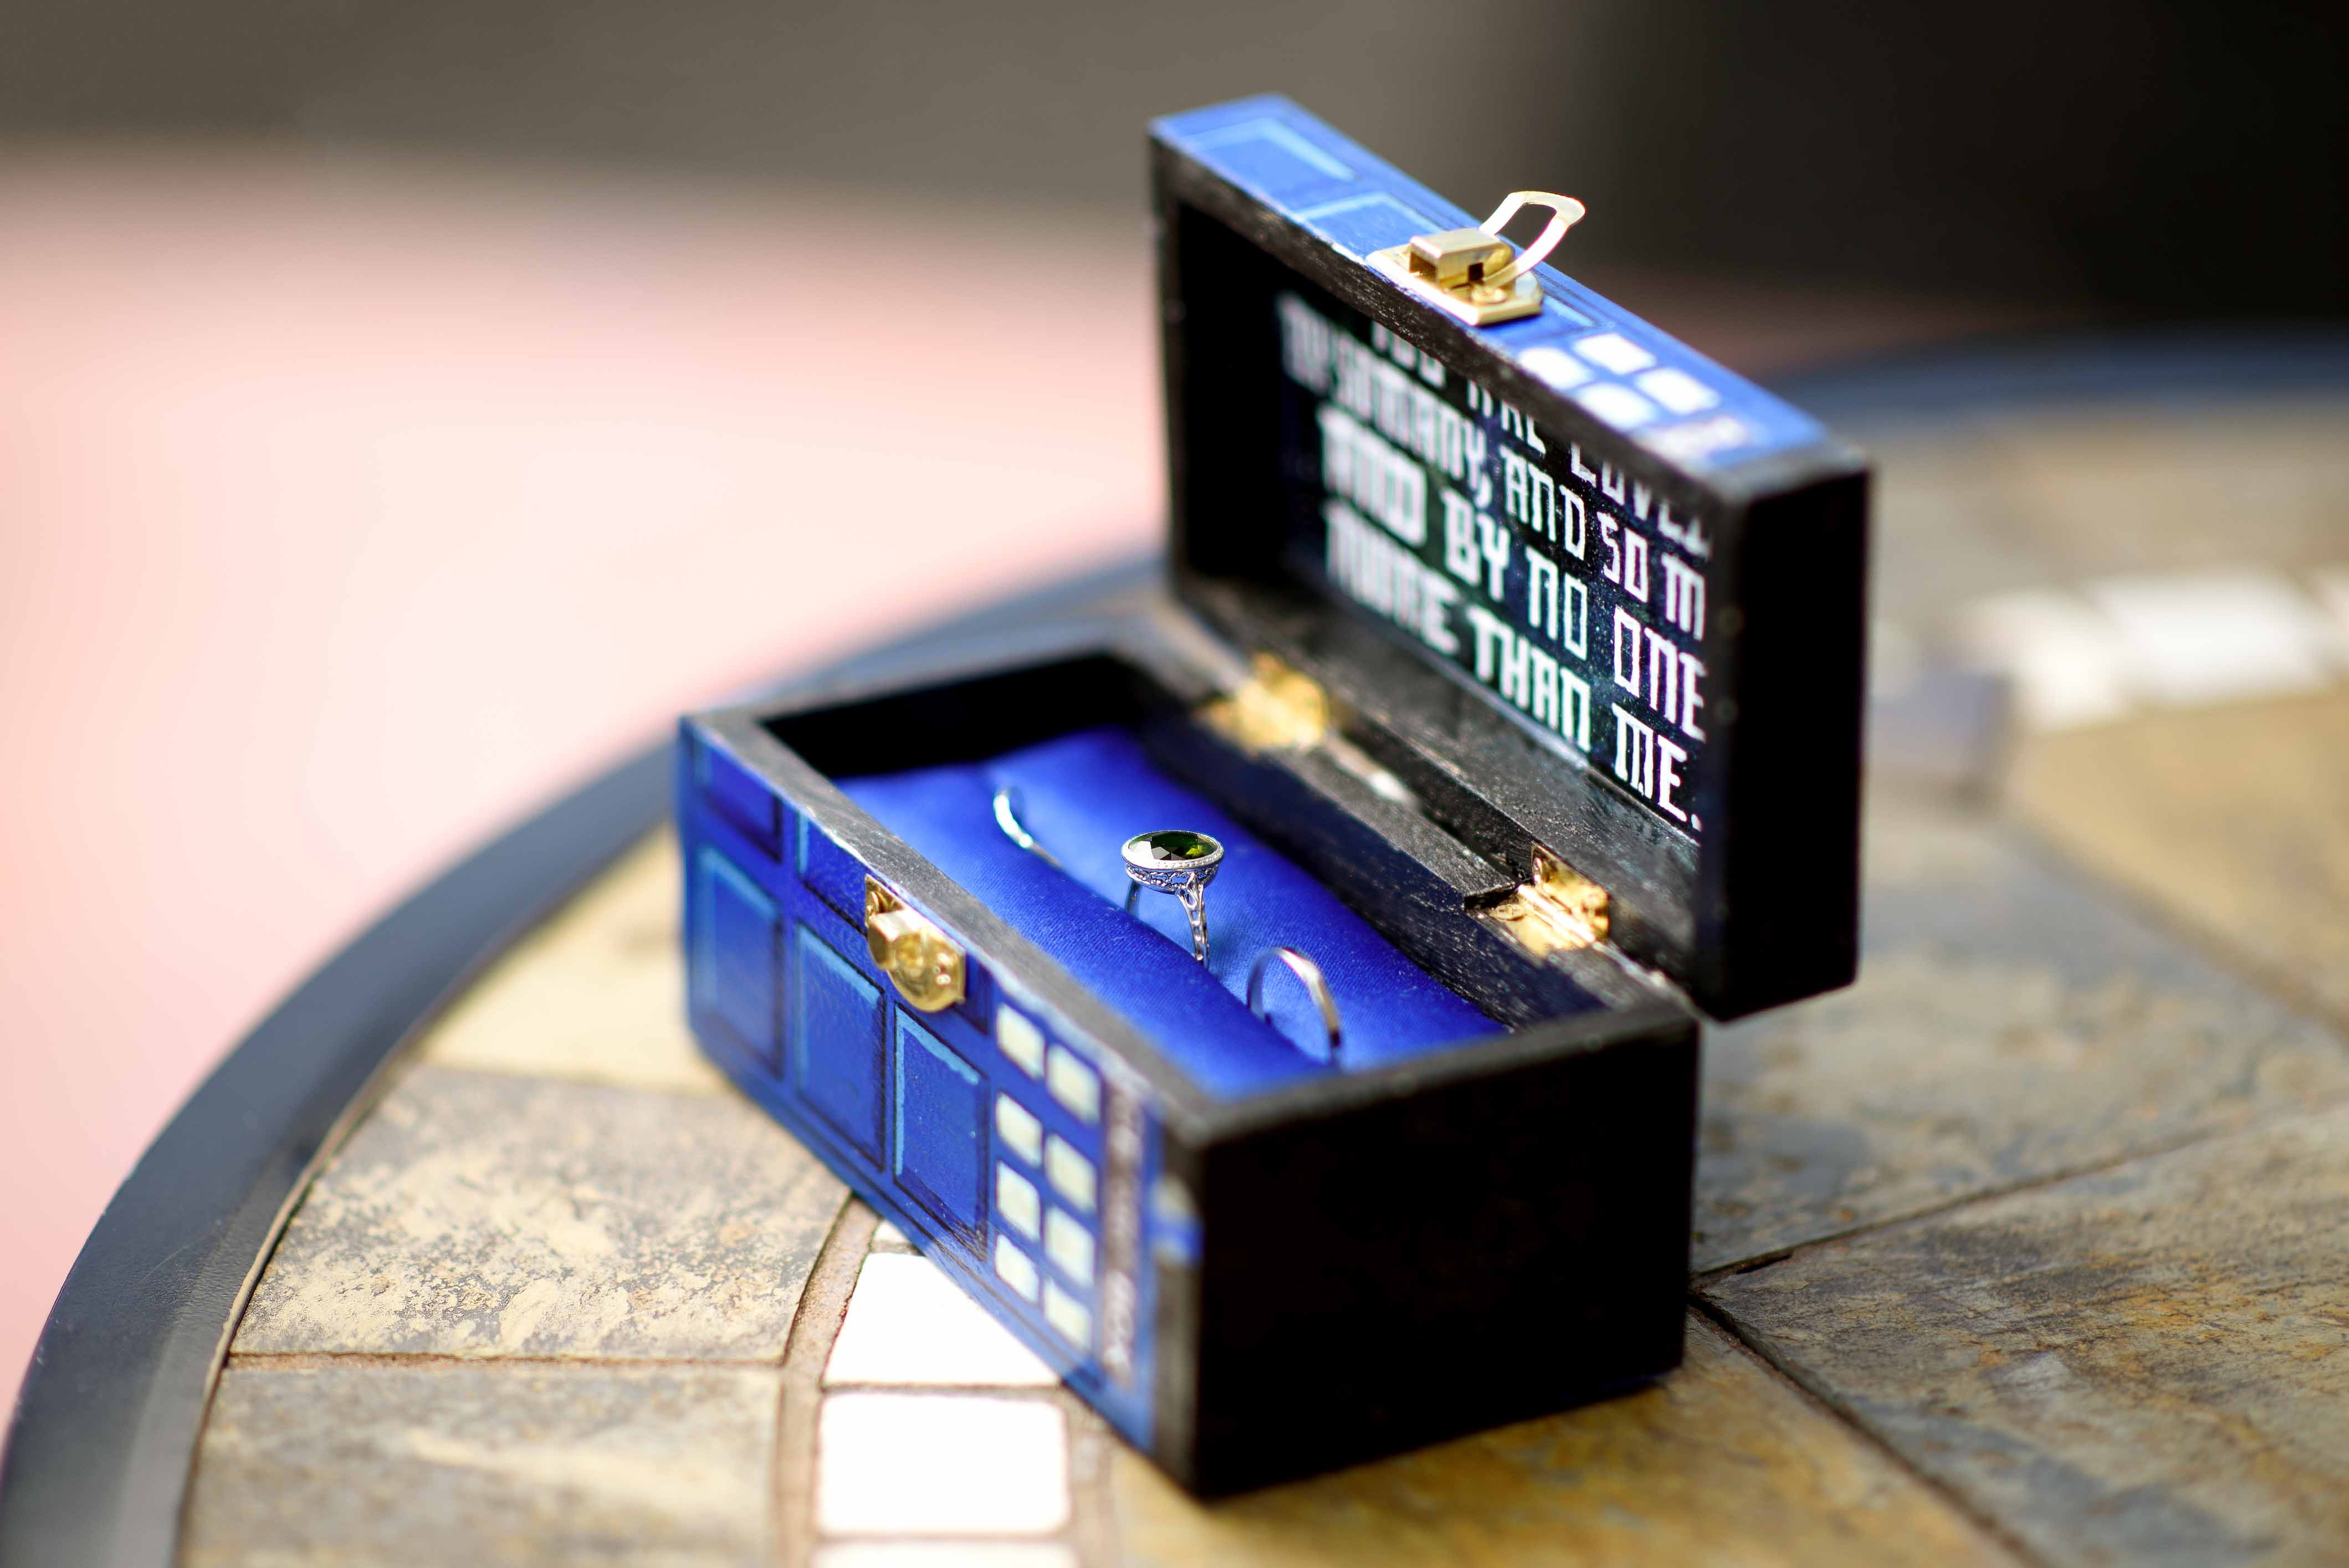 dr who ring box - tardis ring box - dr who wedding ideas - unconventional wedding